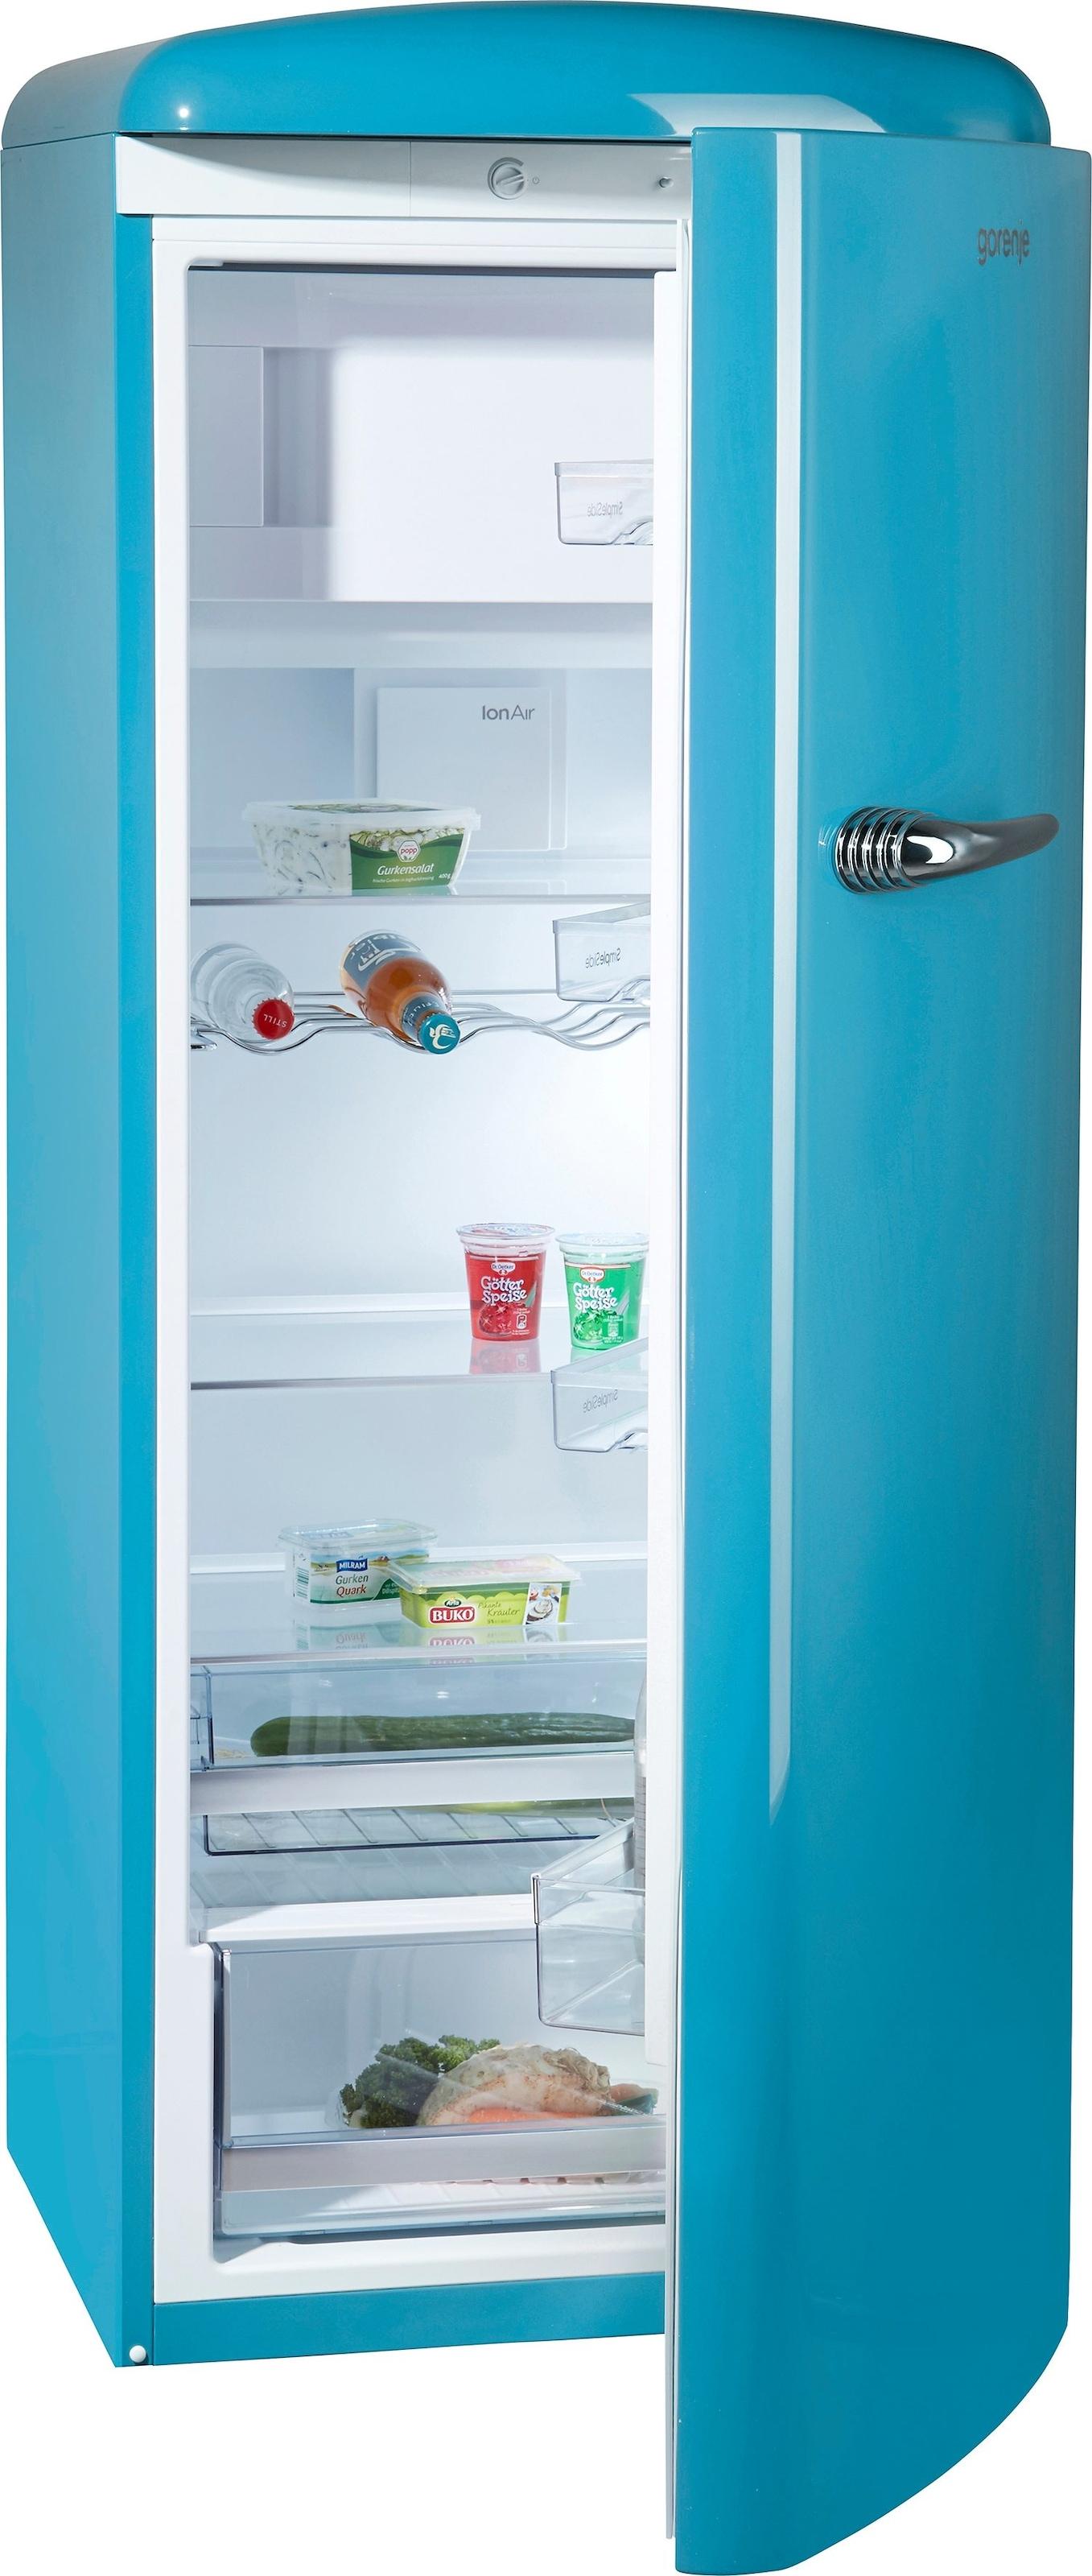 Gorenje Kühlschrank Vw Kaufen : Gorenje kühlschränke ao